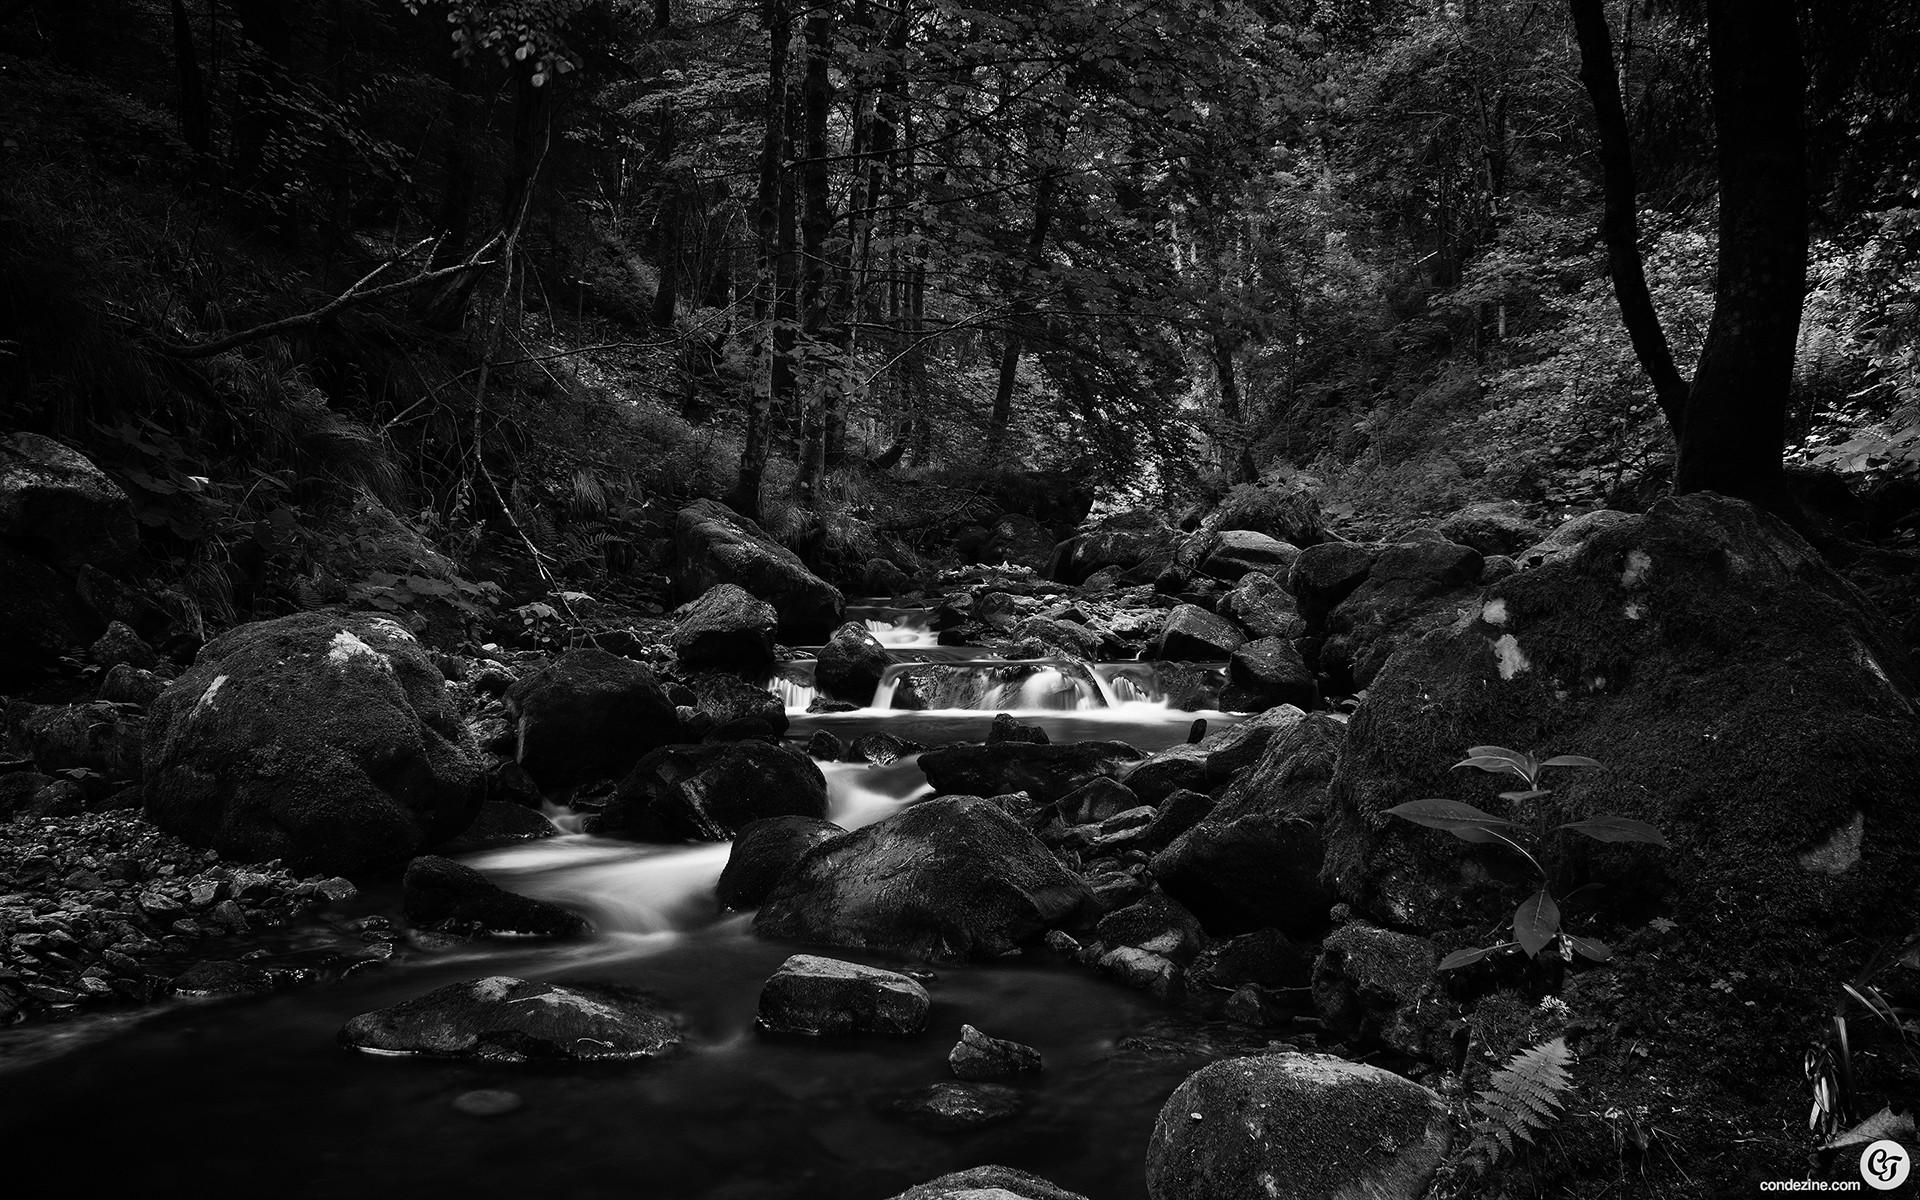 Photography – Black & White Landscape Scenic Forest River Stream Wallpaper